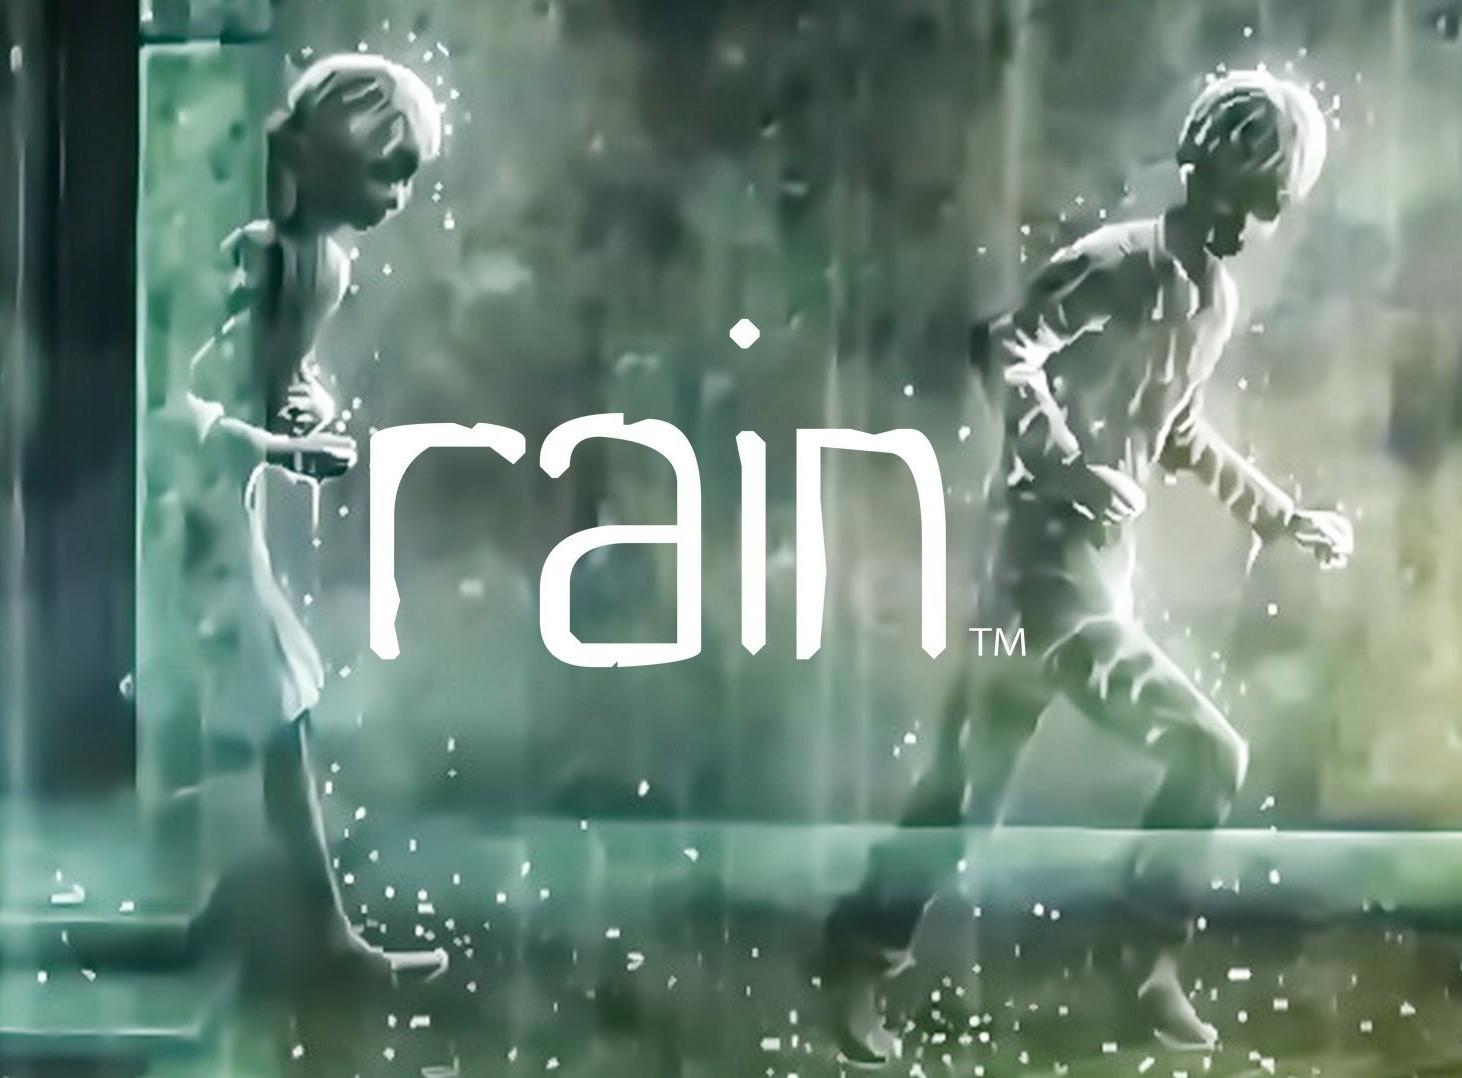 http://static.tvtropes.org/pmwiki/pub/images/rain_game_duo.jpg